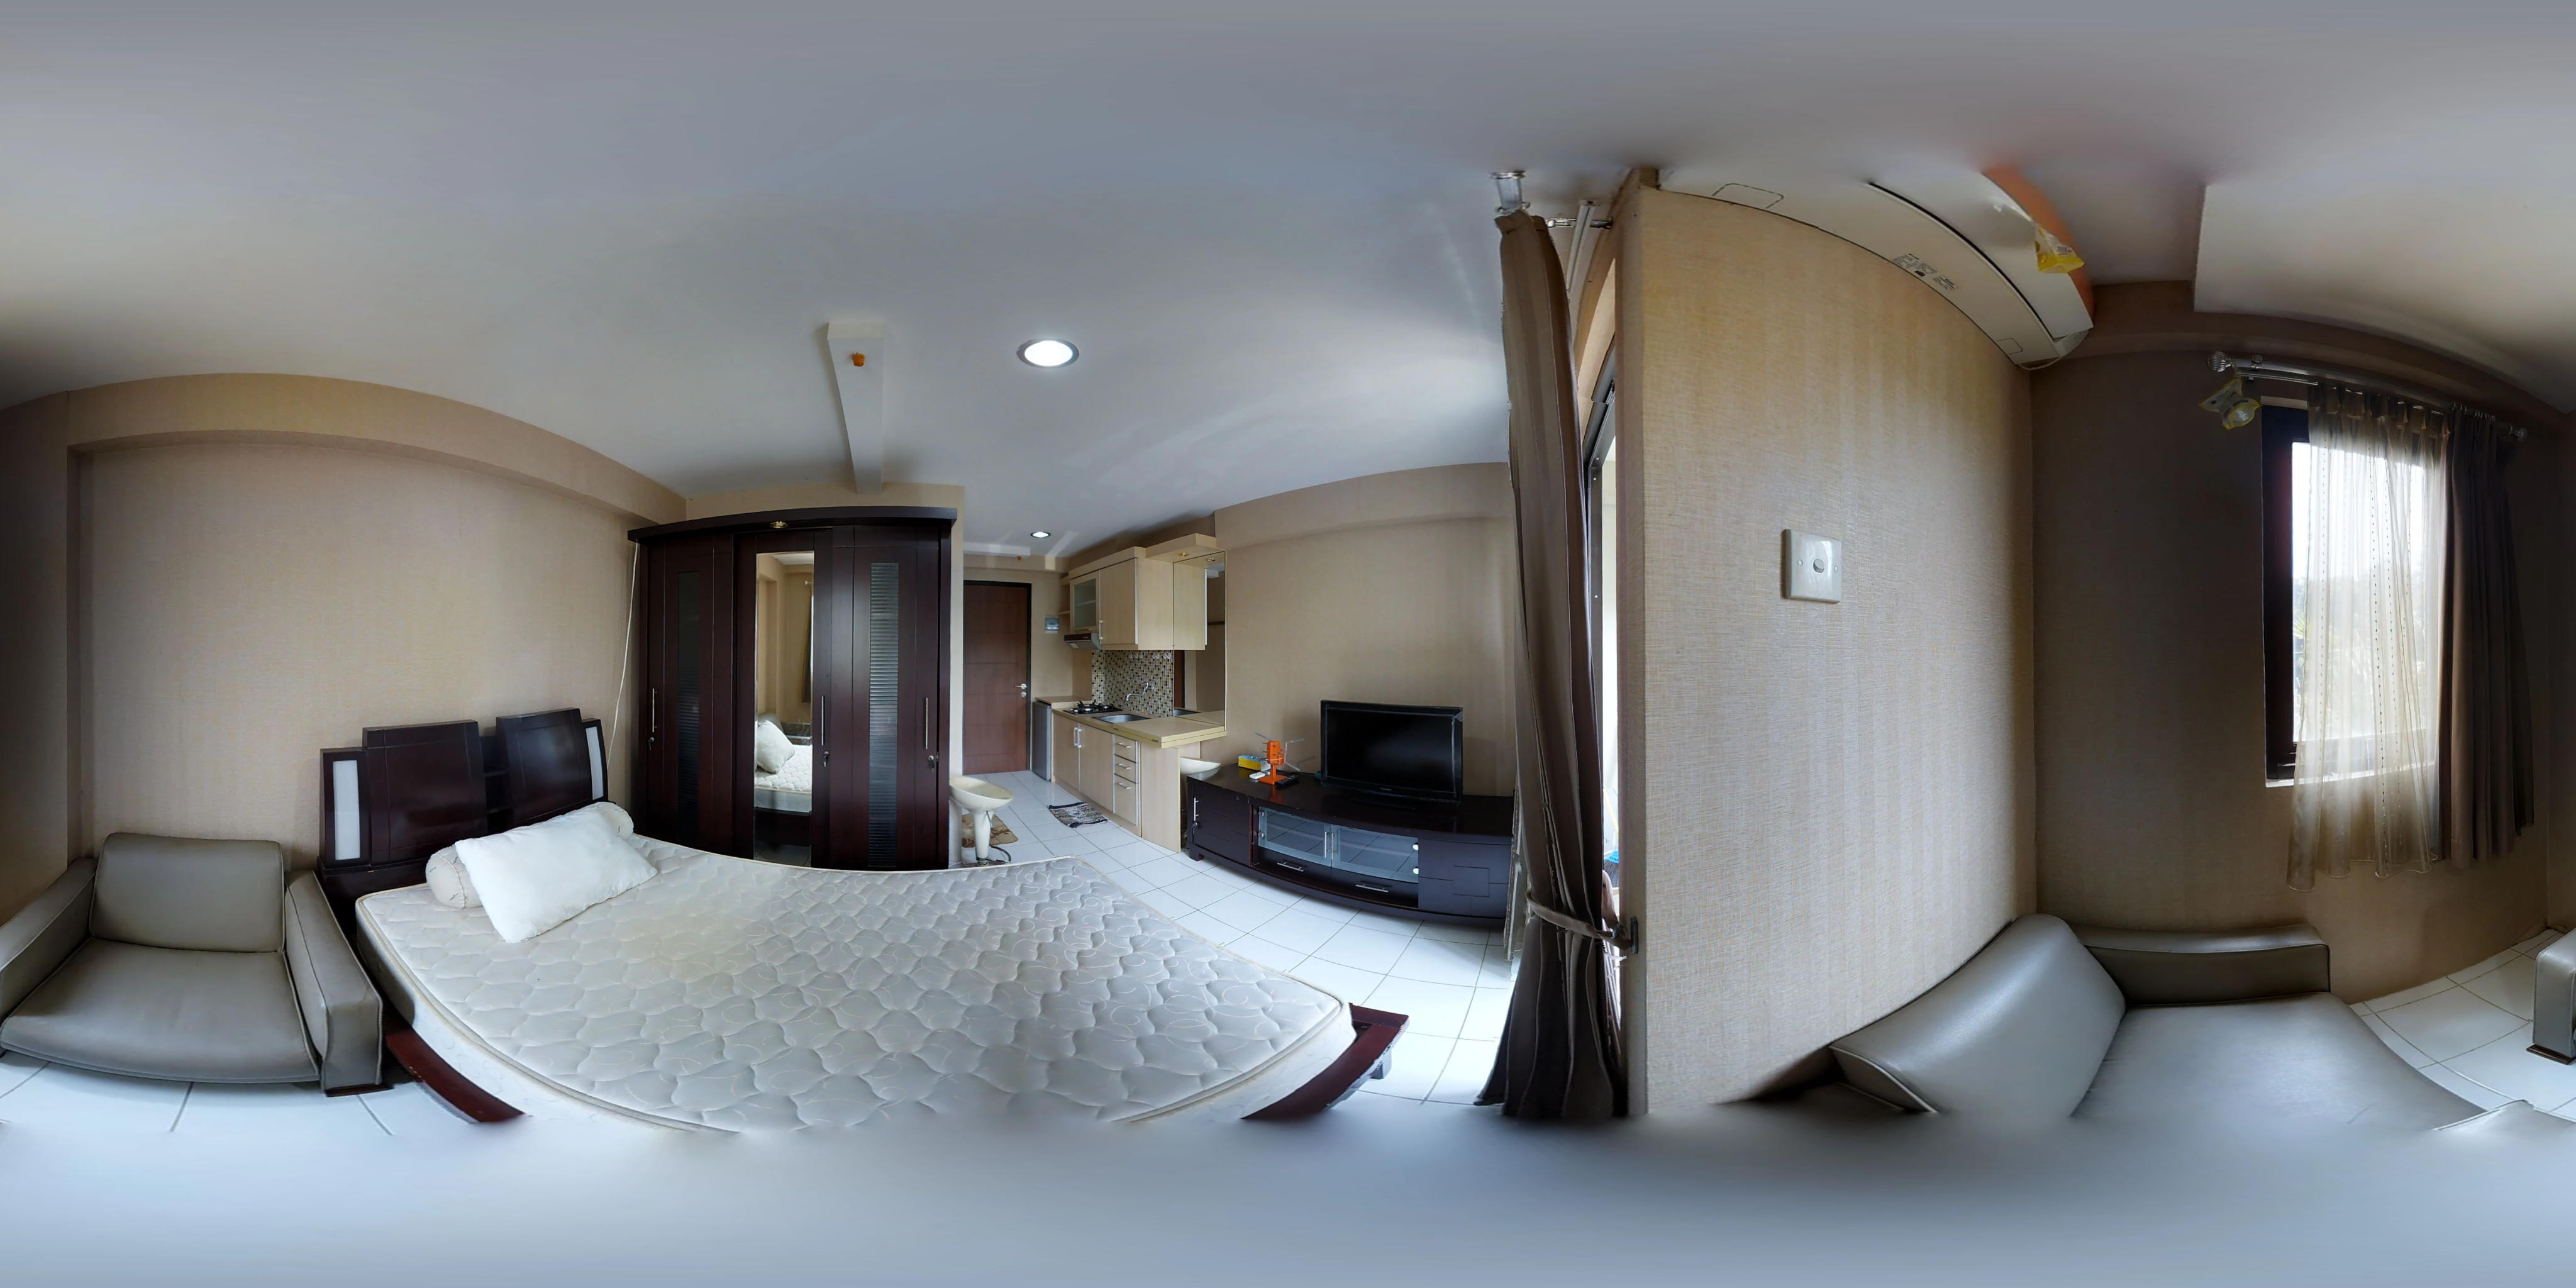 for rent Kebagusan City - Luxury studio room at south jakarta